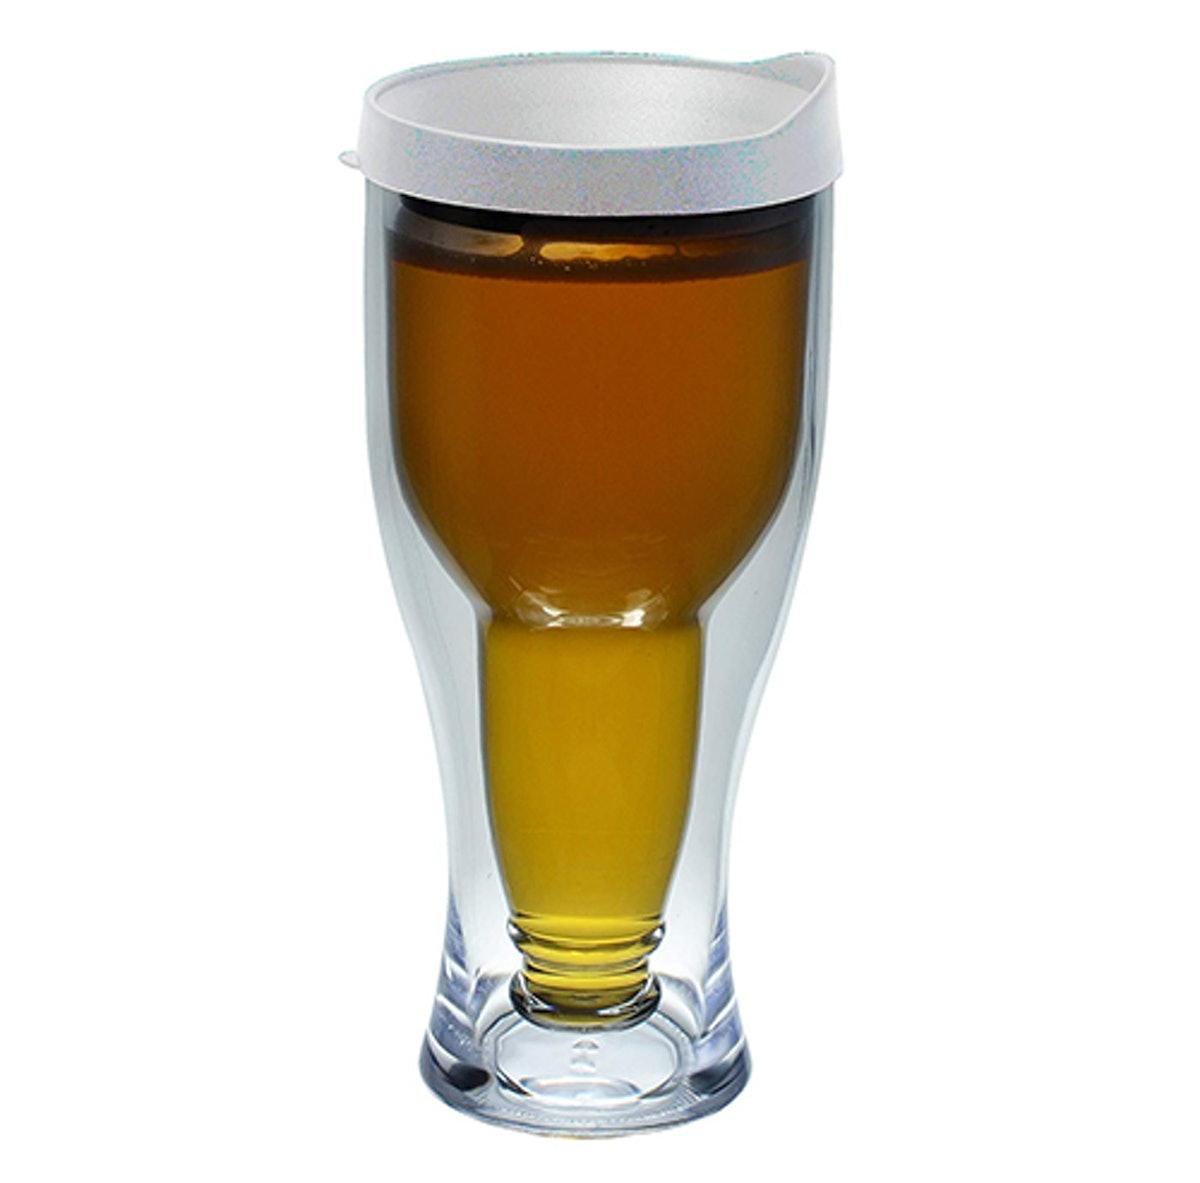 Southern Homewares Beer Tumbler